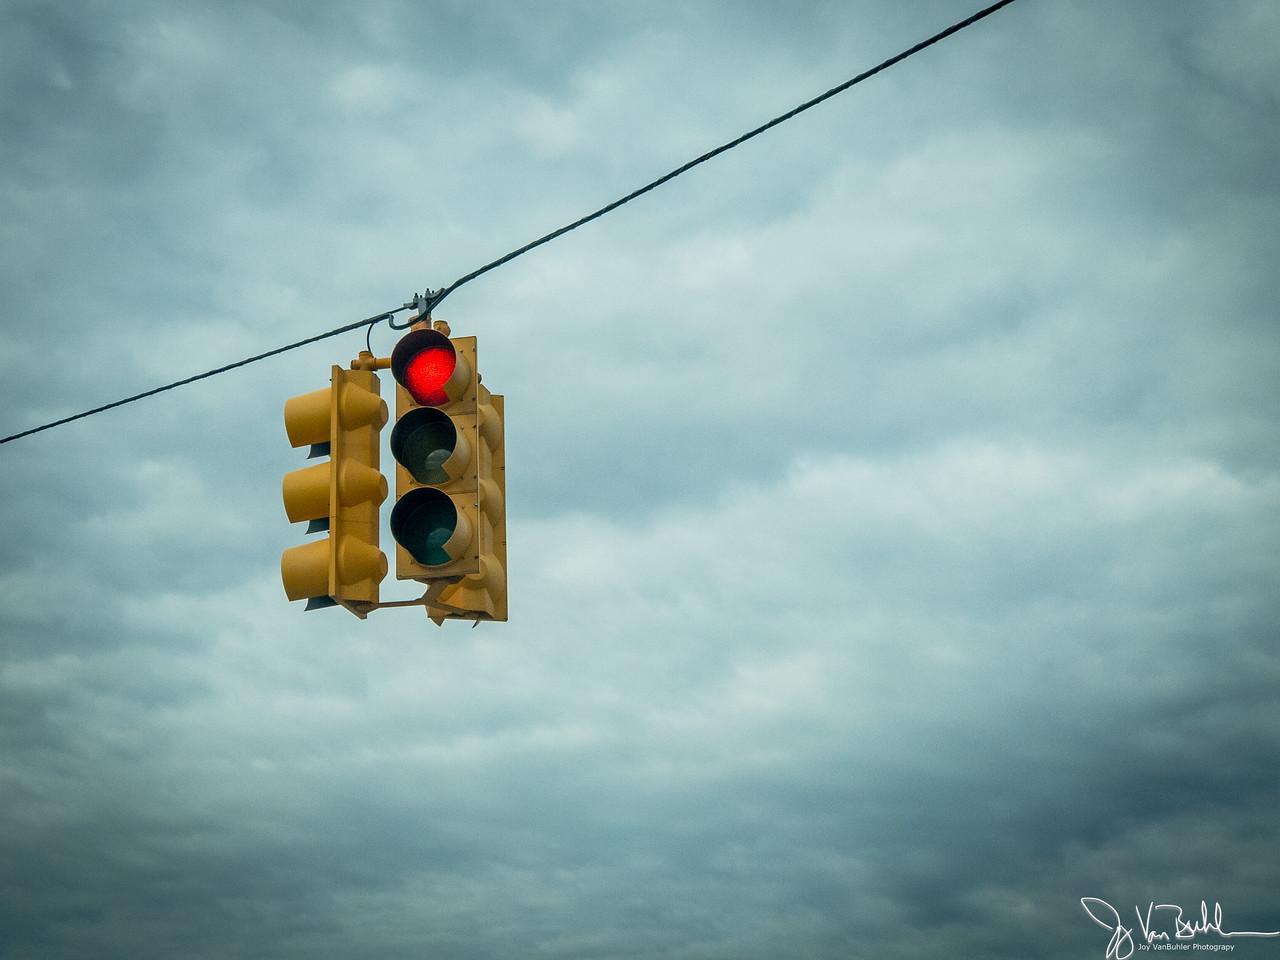 81/365 - Stop Light